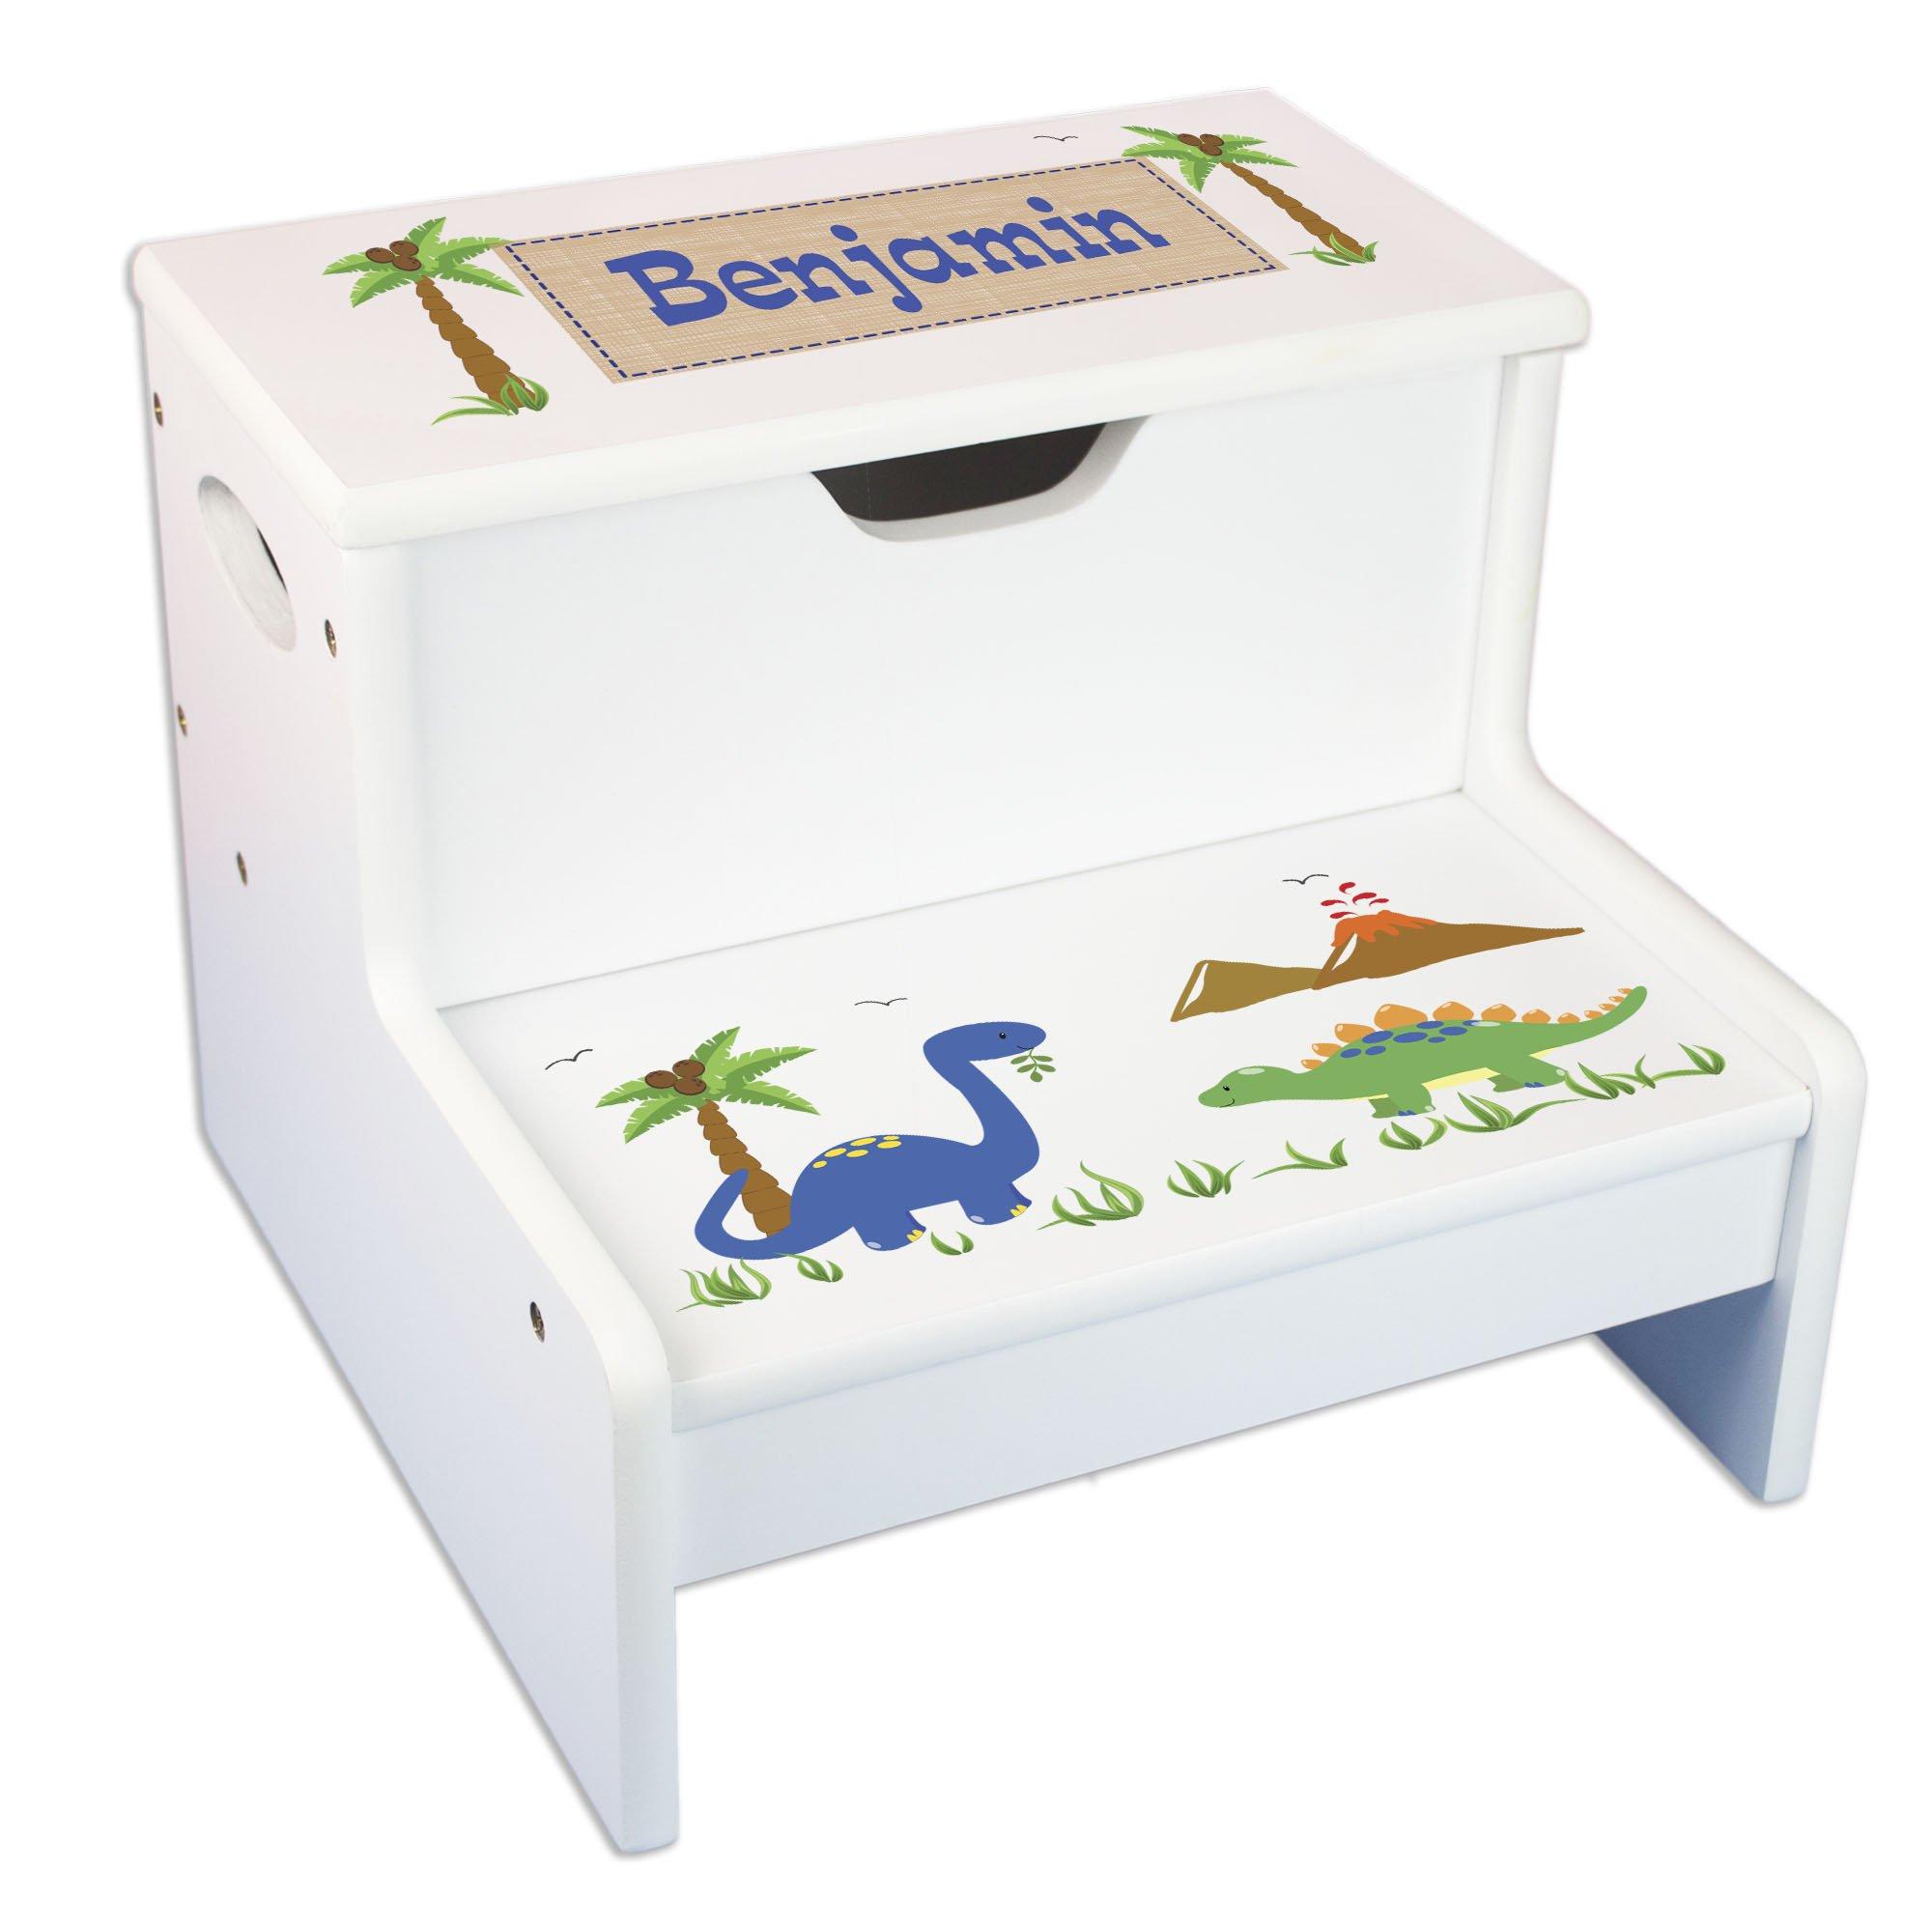 Personalized Dinosaur Storage Step Stool